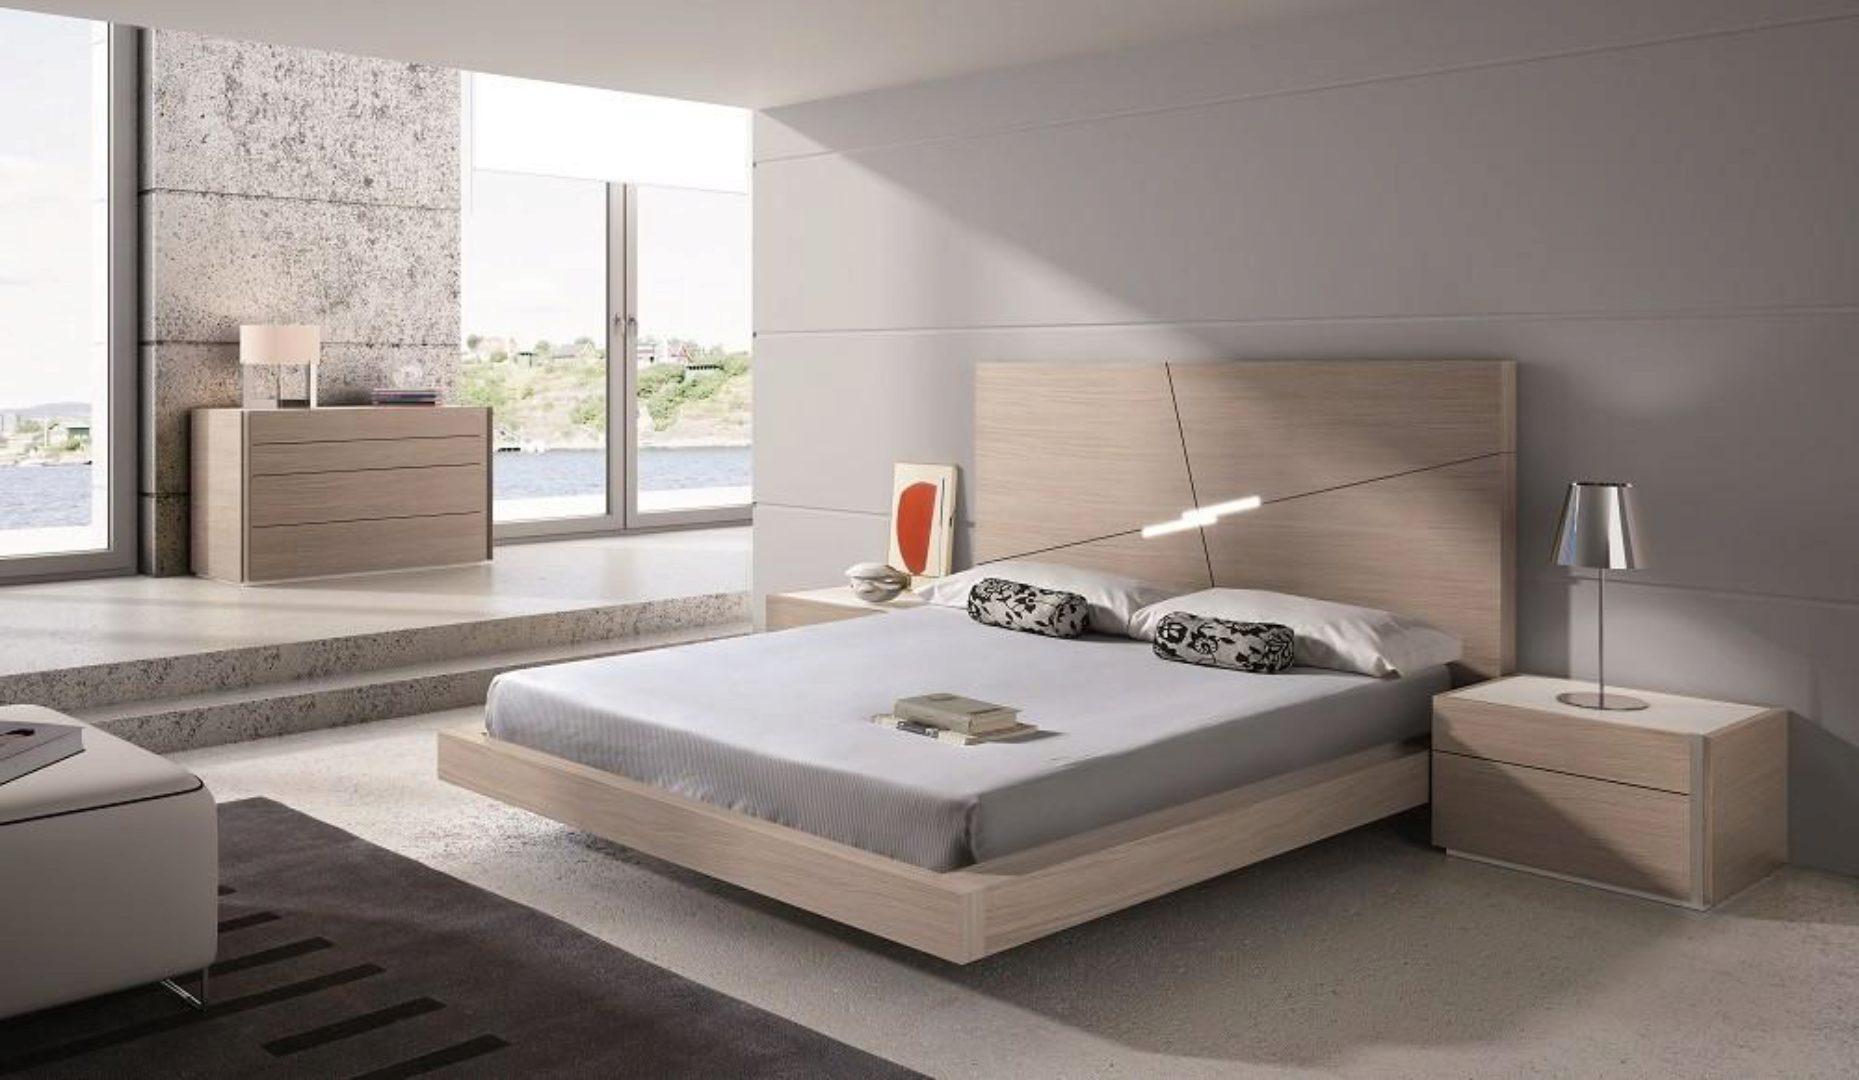 J M Evora Modern Wood Veneers Natural Lacquers Premium Platform King Size Bedroom Set 5pcs J Amp M Sku18145 Ek Set 5